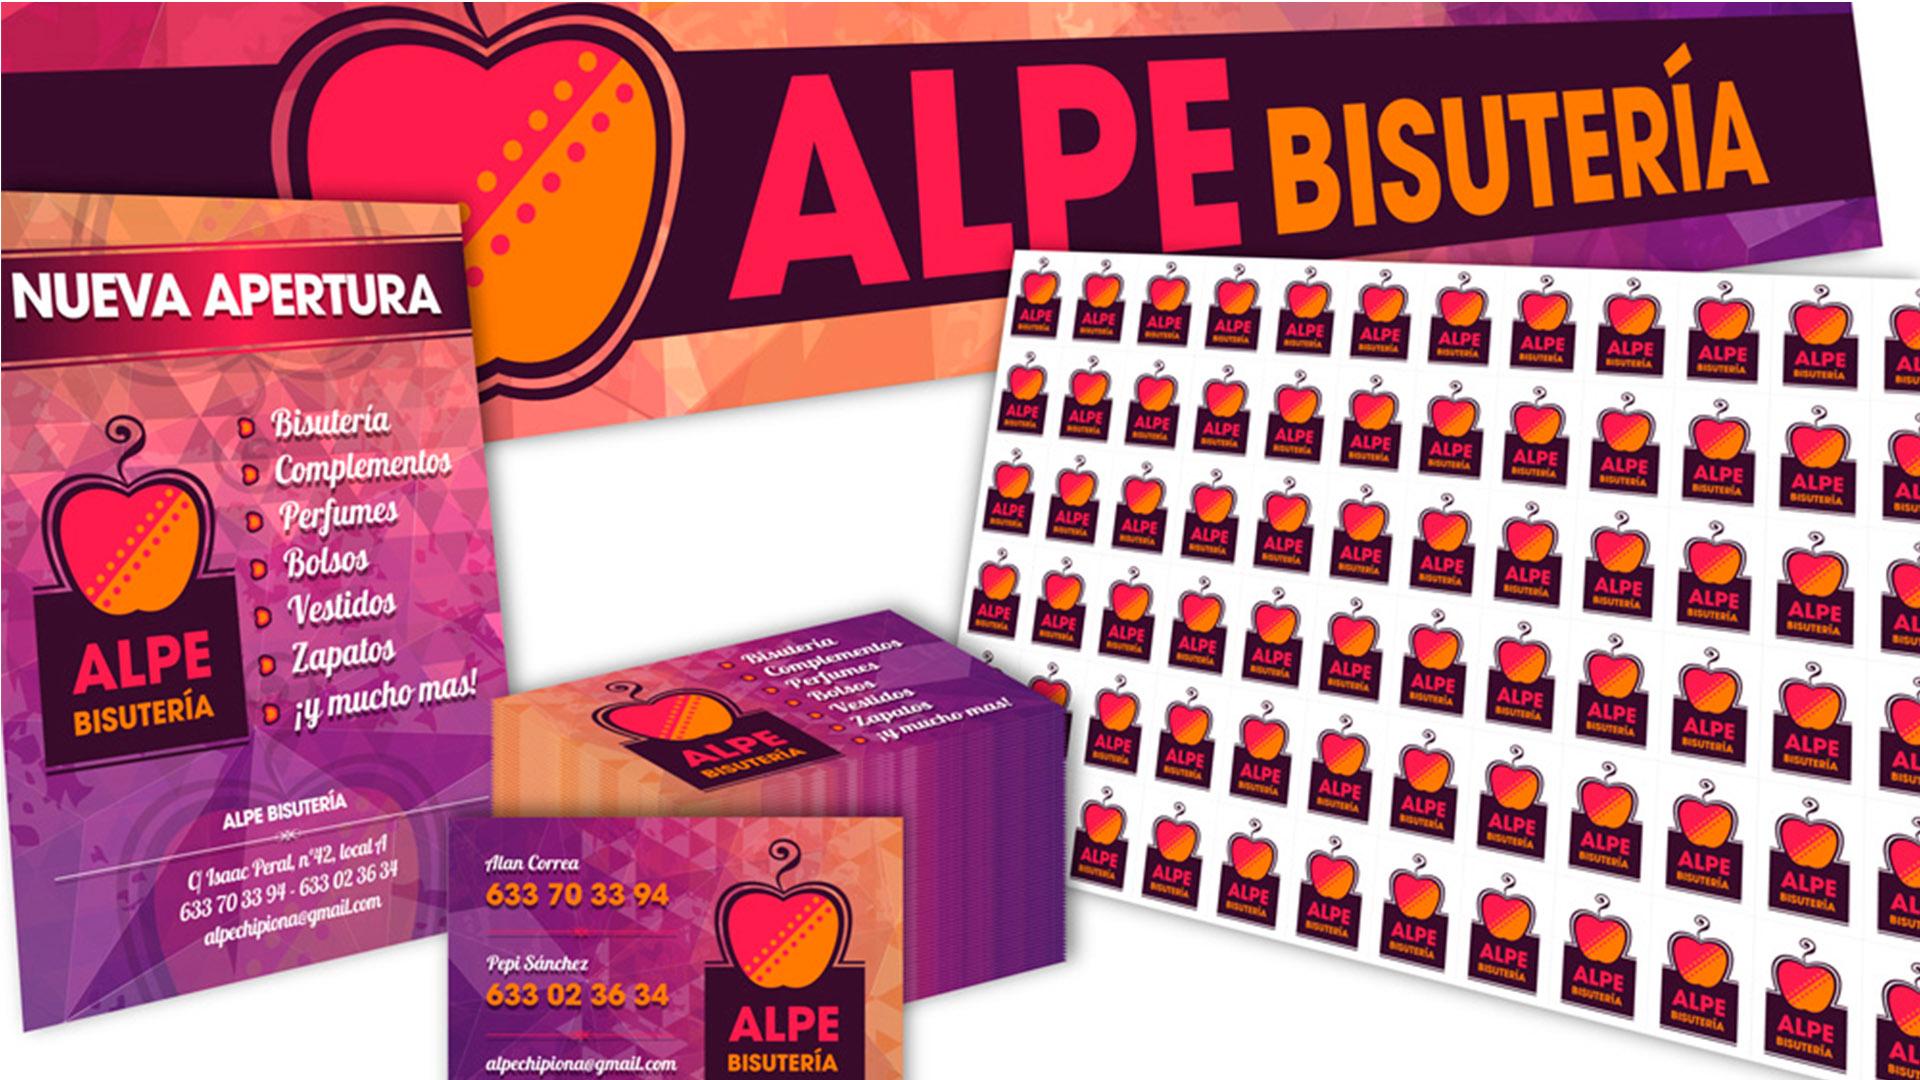 Alpe Bisutería